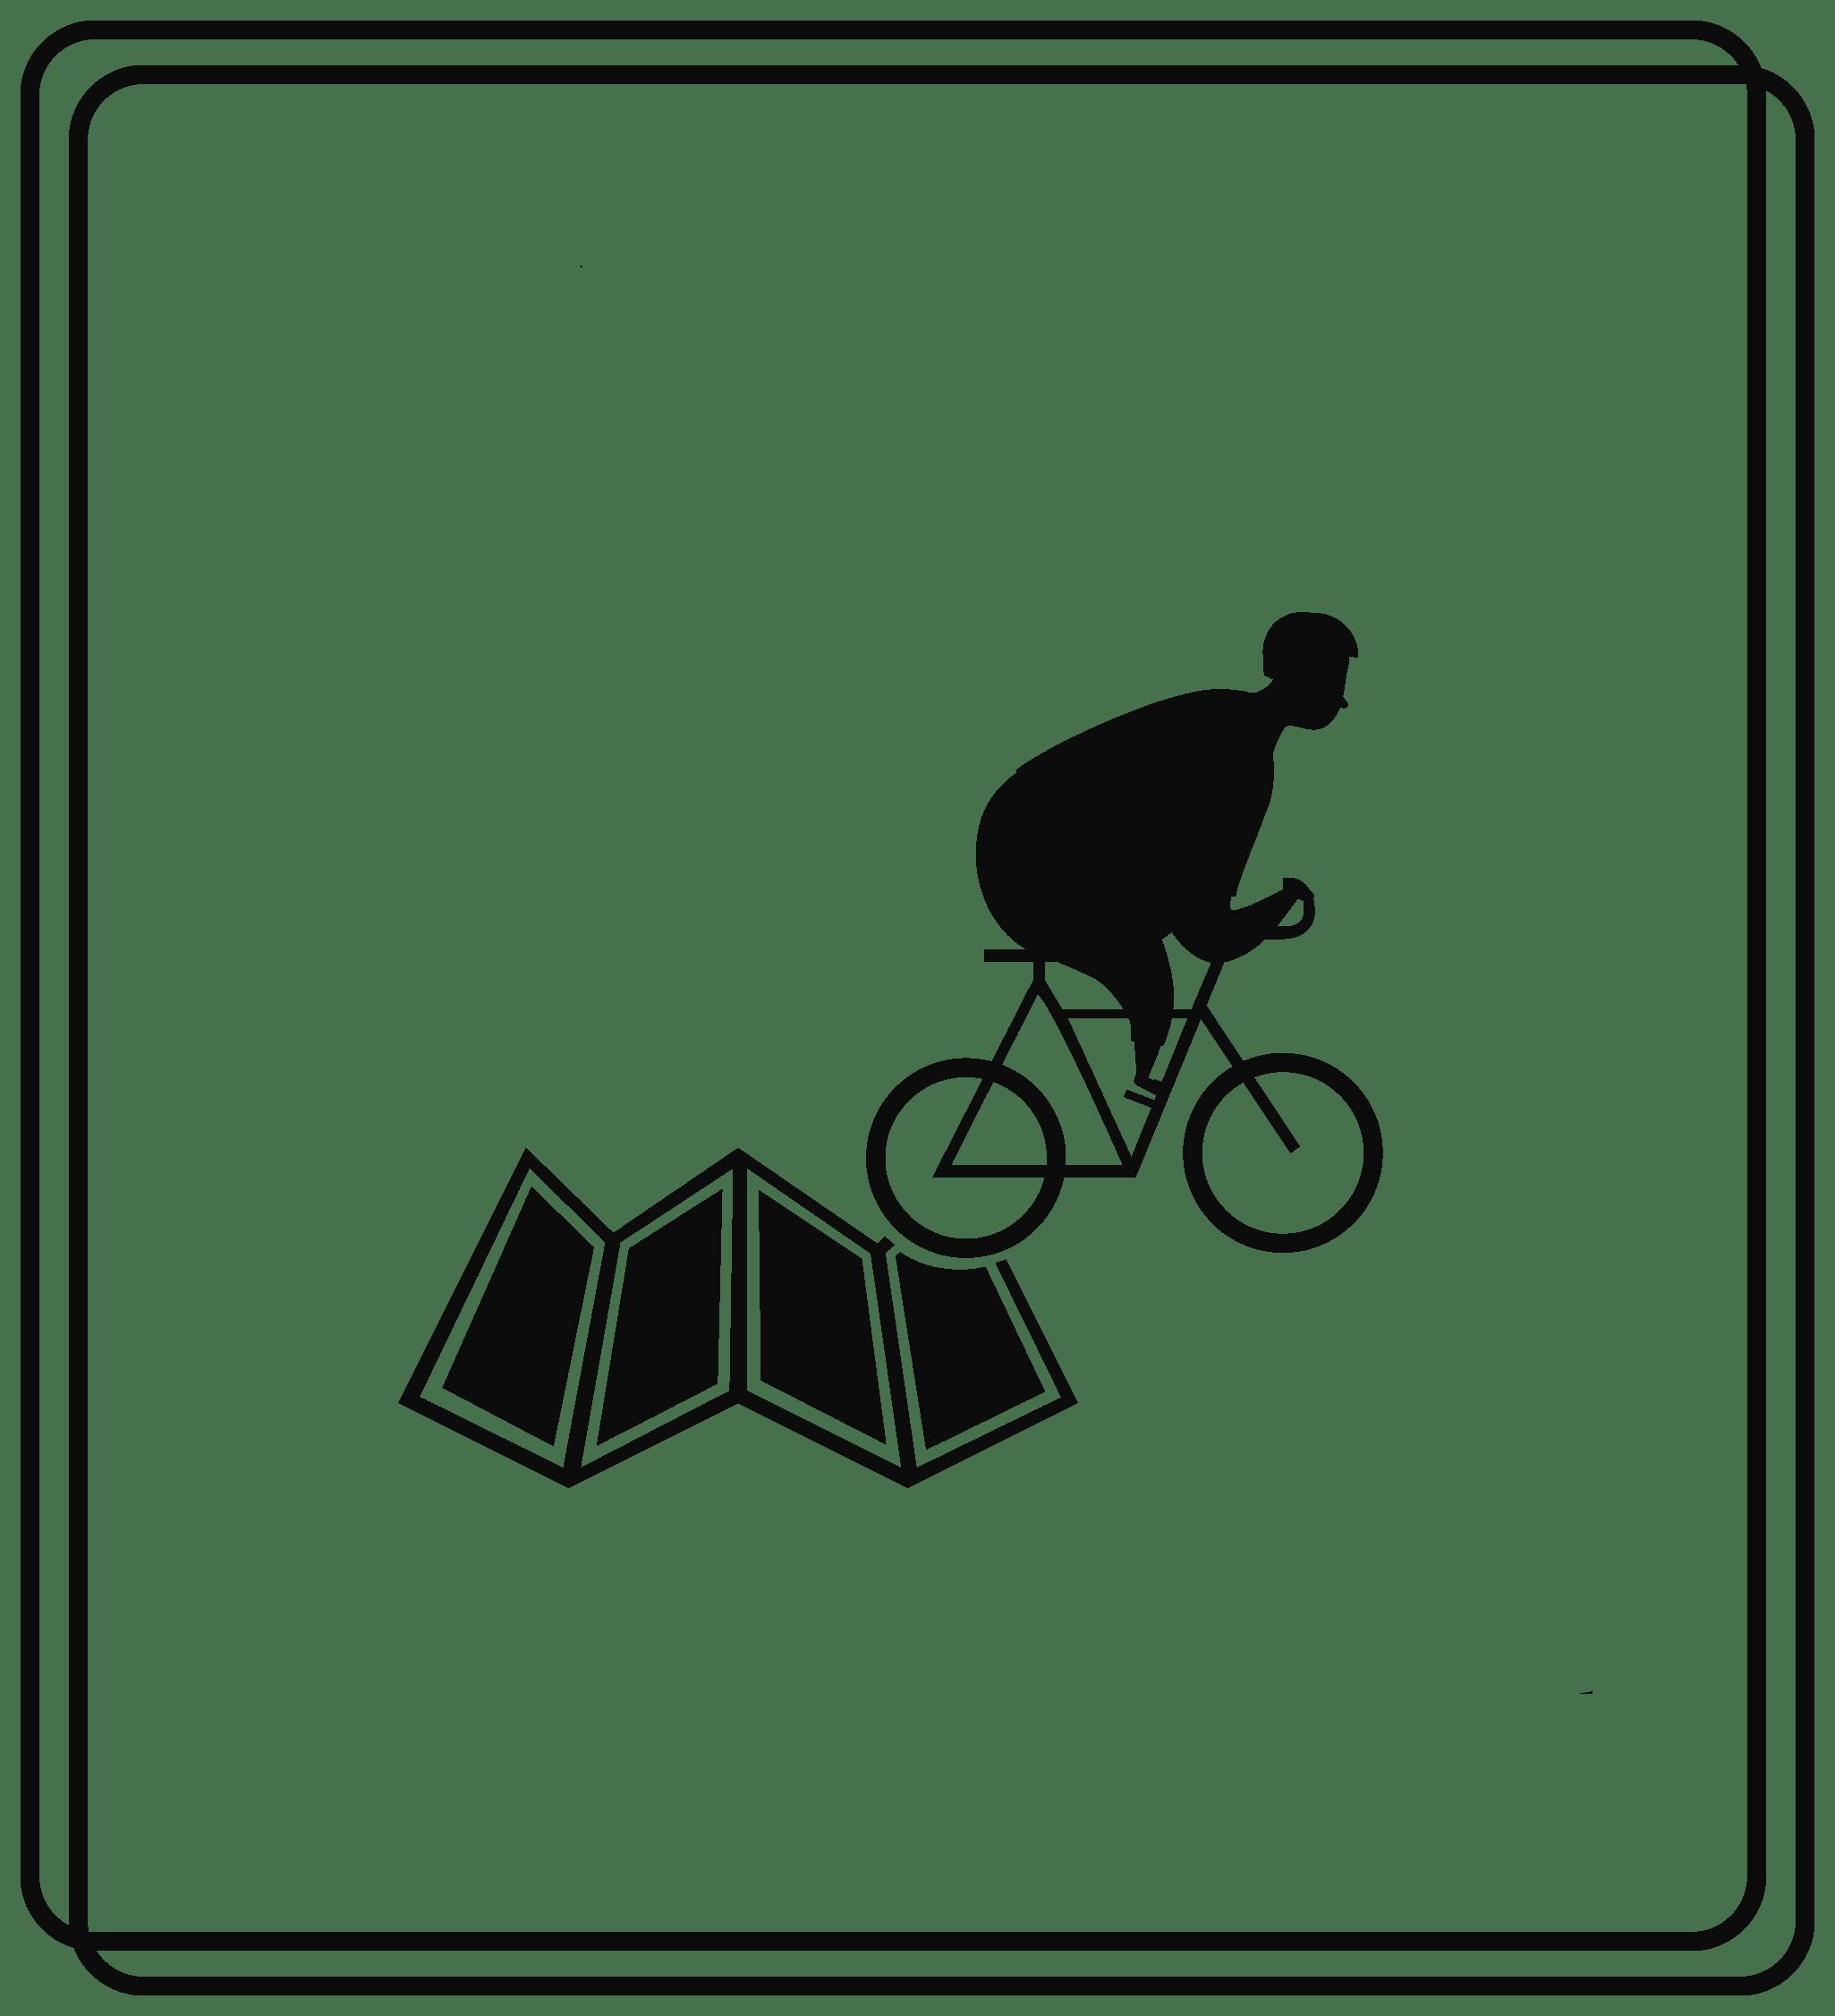 heavy-rider-image1